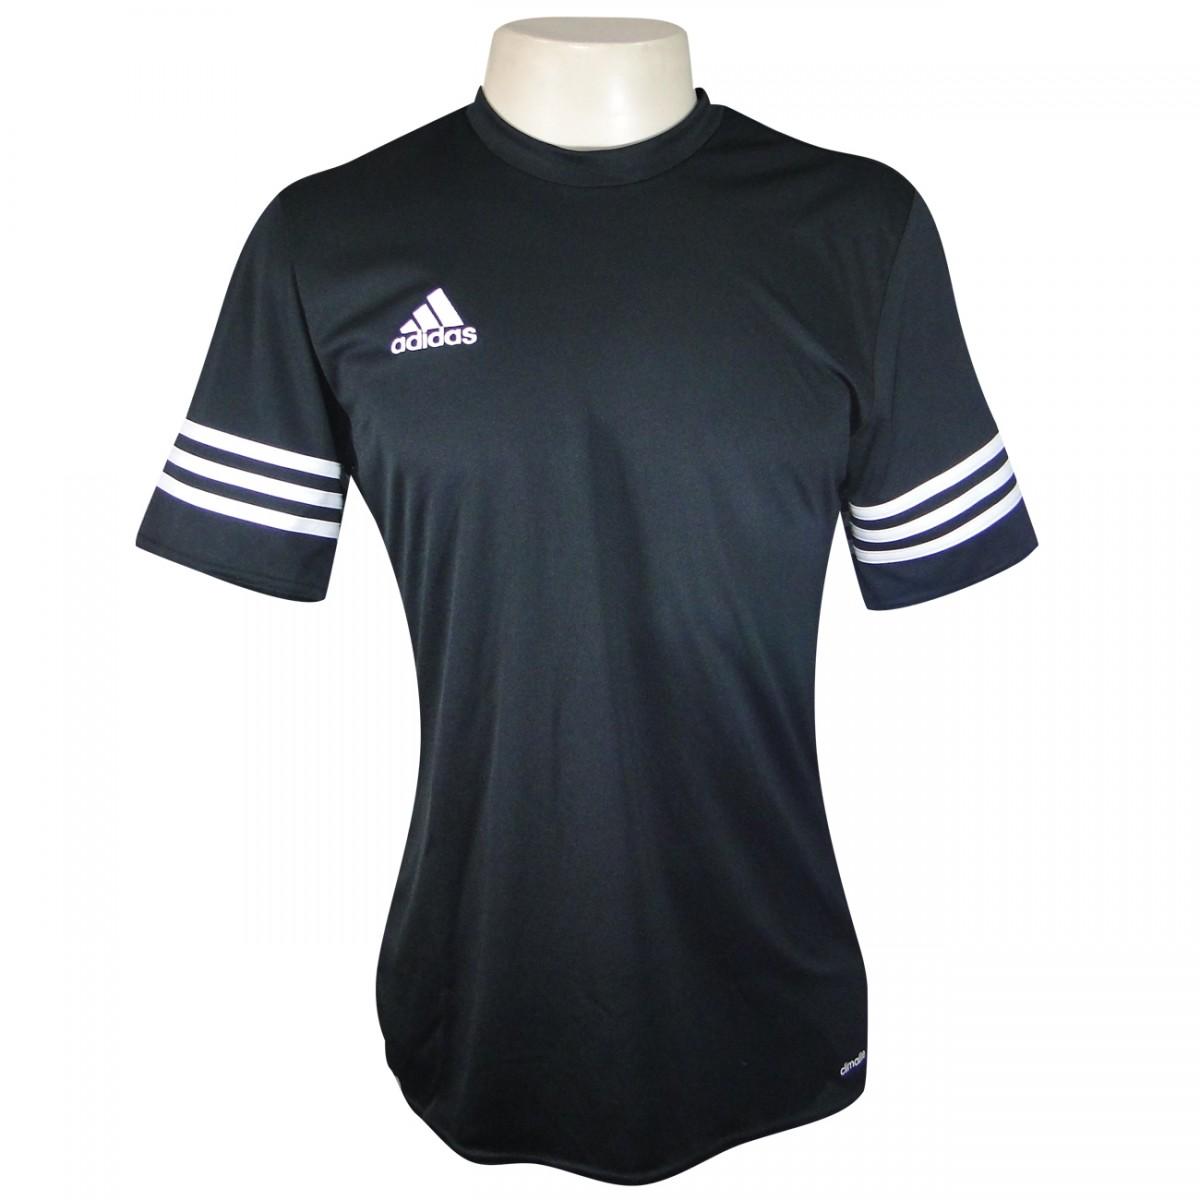 44e07cc5cf71c Camiseta Adidas Entrada 14 F50486 - Preto Branco - Chuteira Nike ...